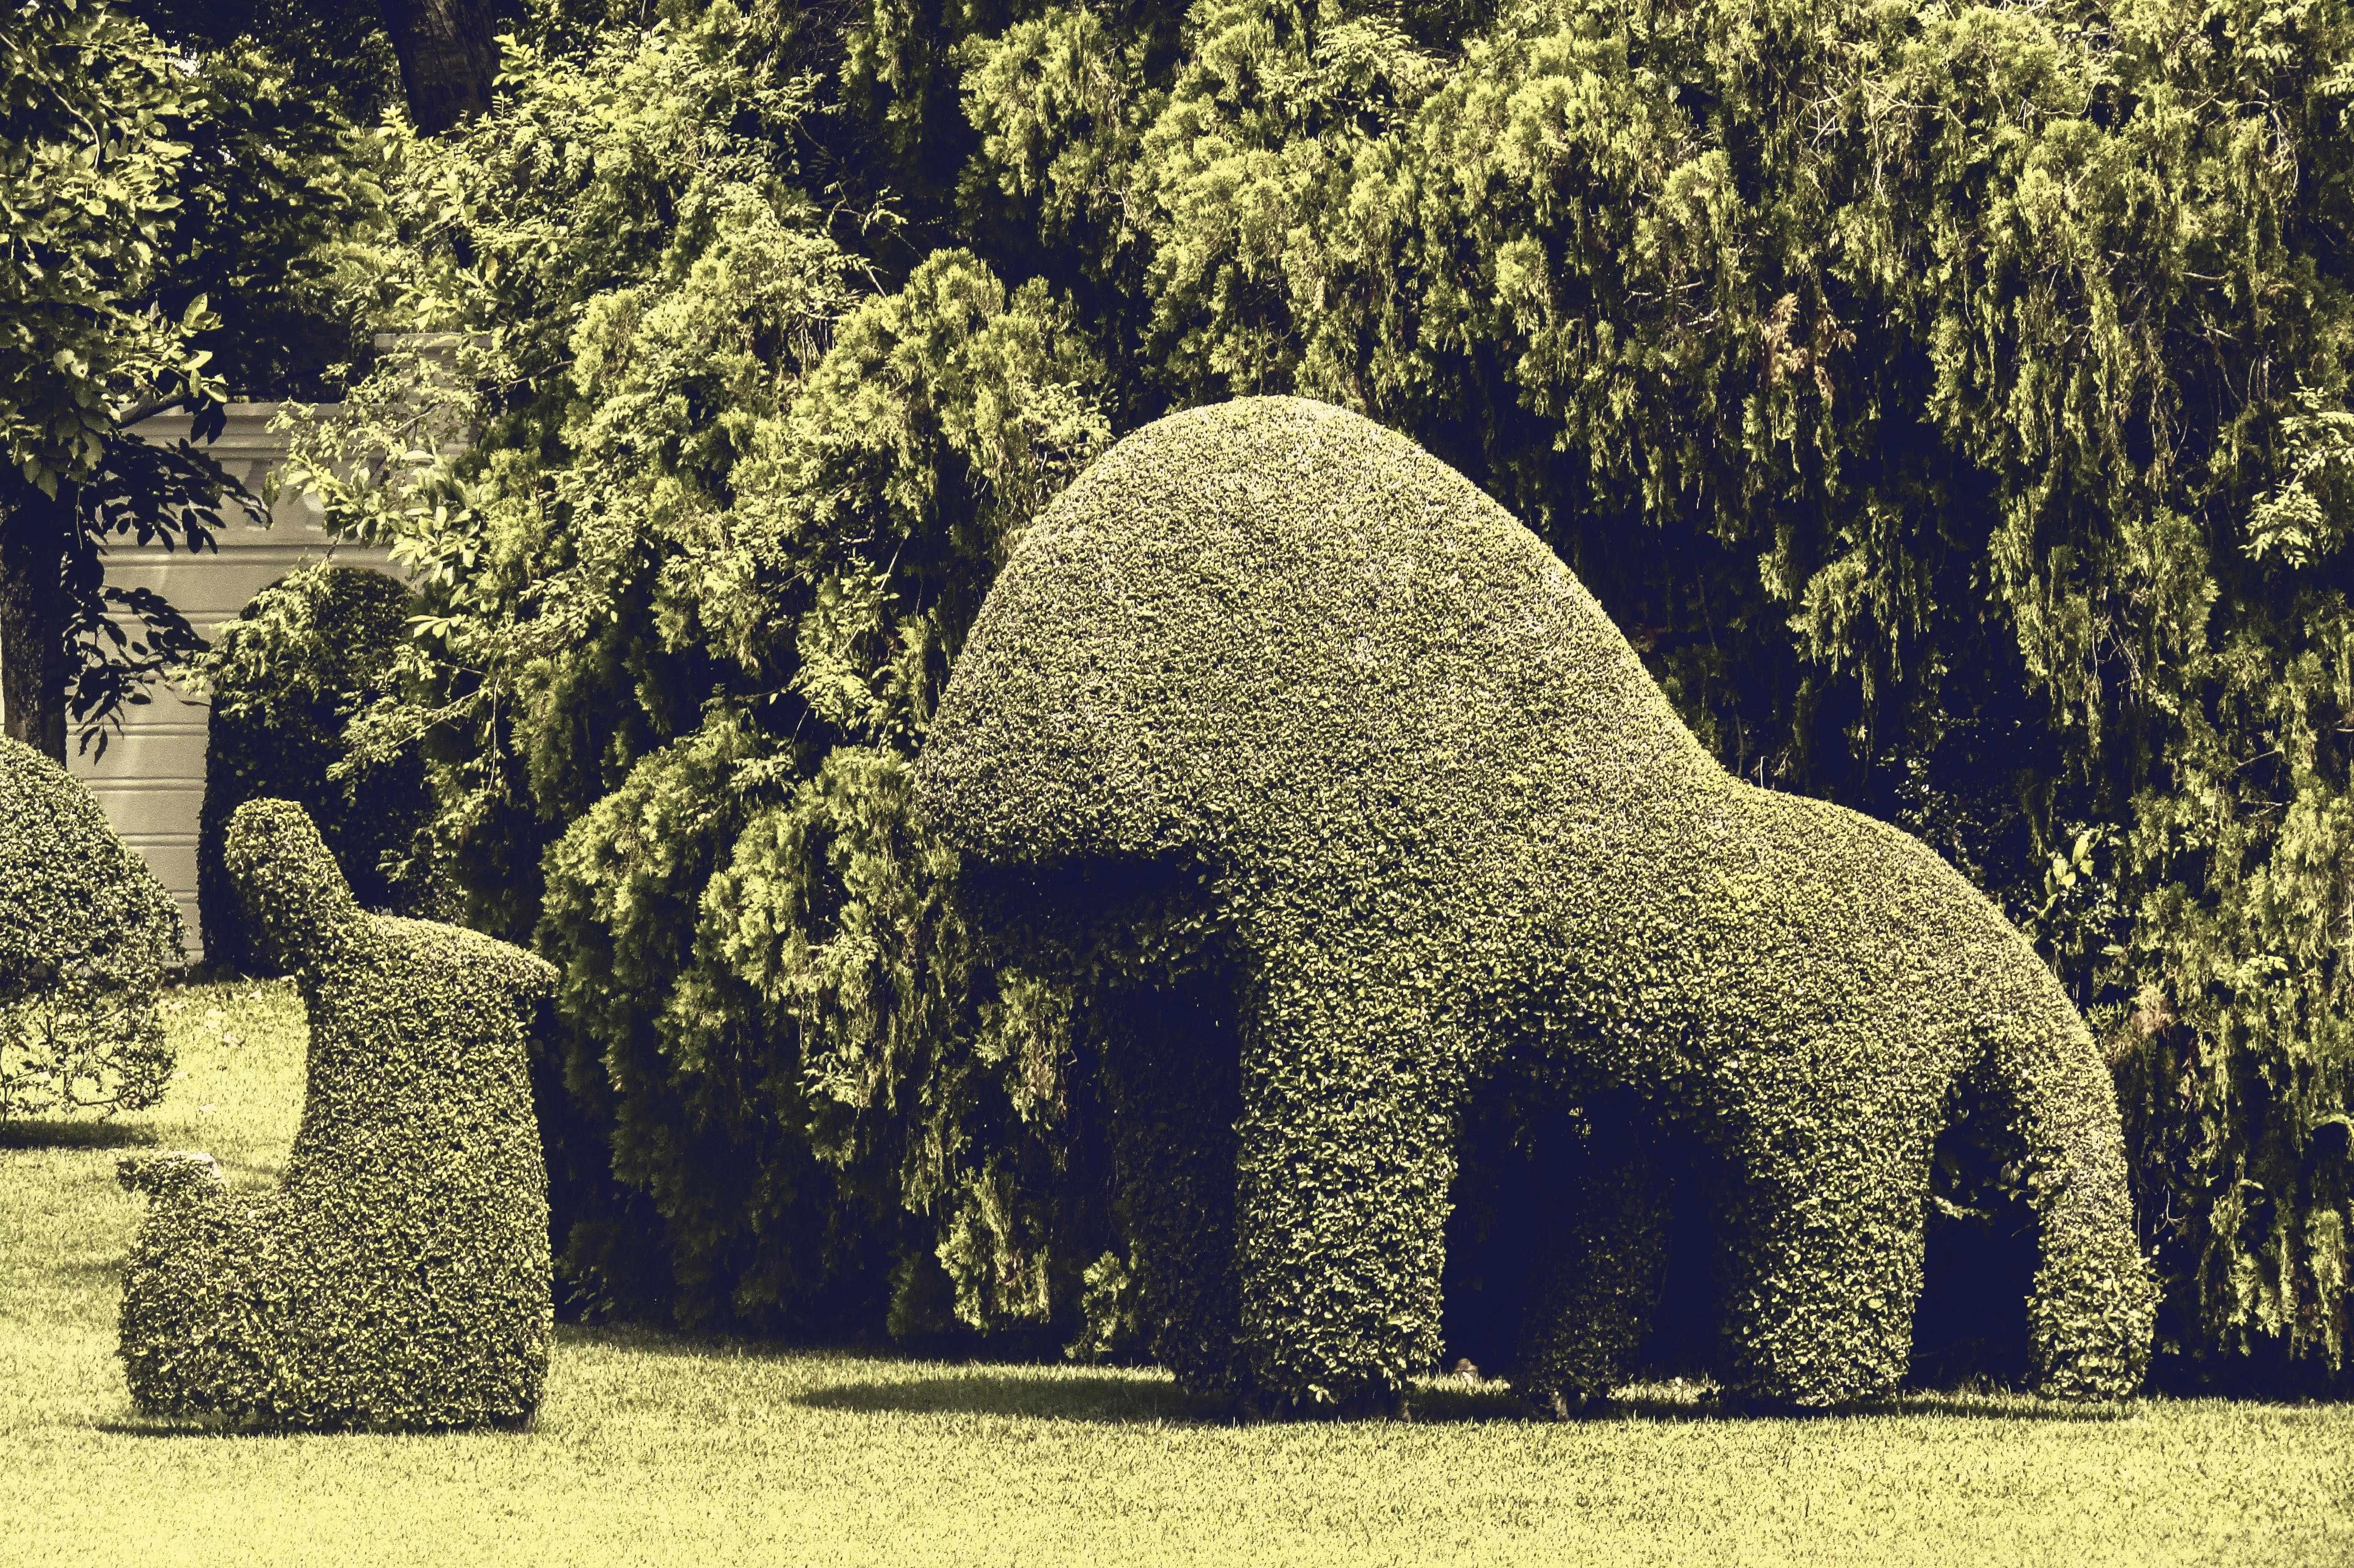 Two Animal Topiary on Garden